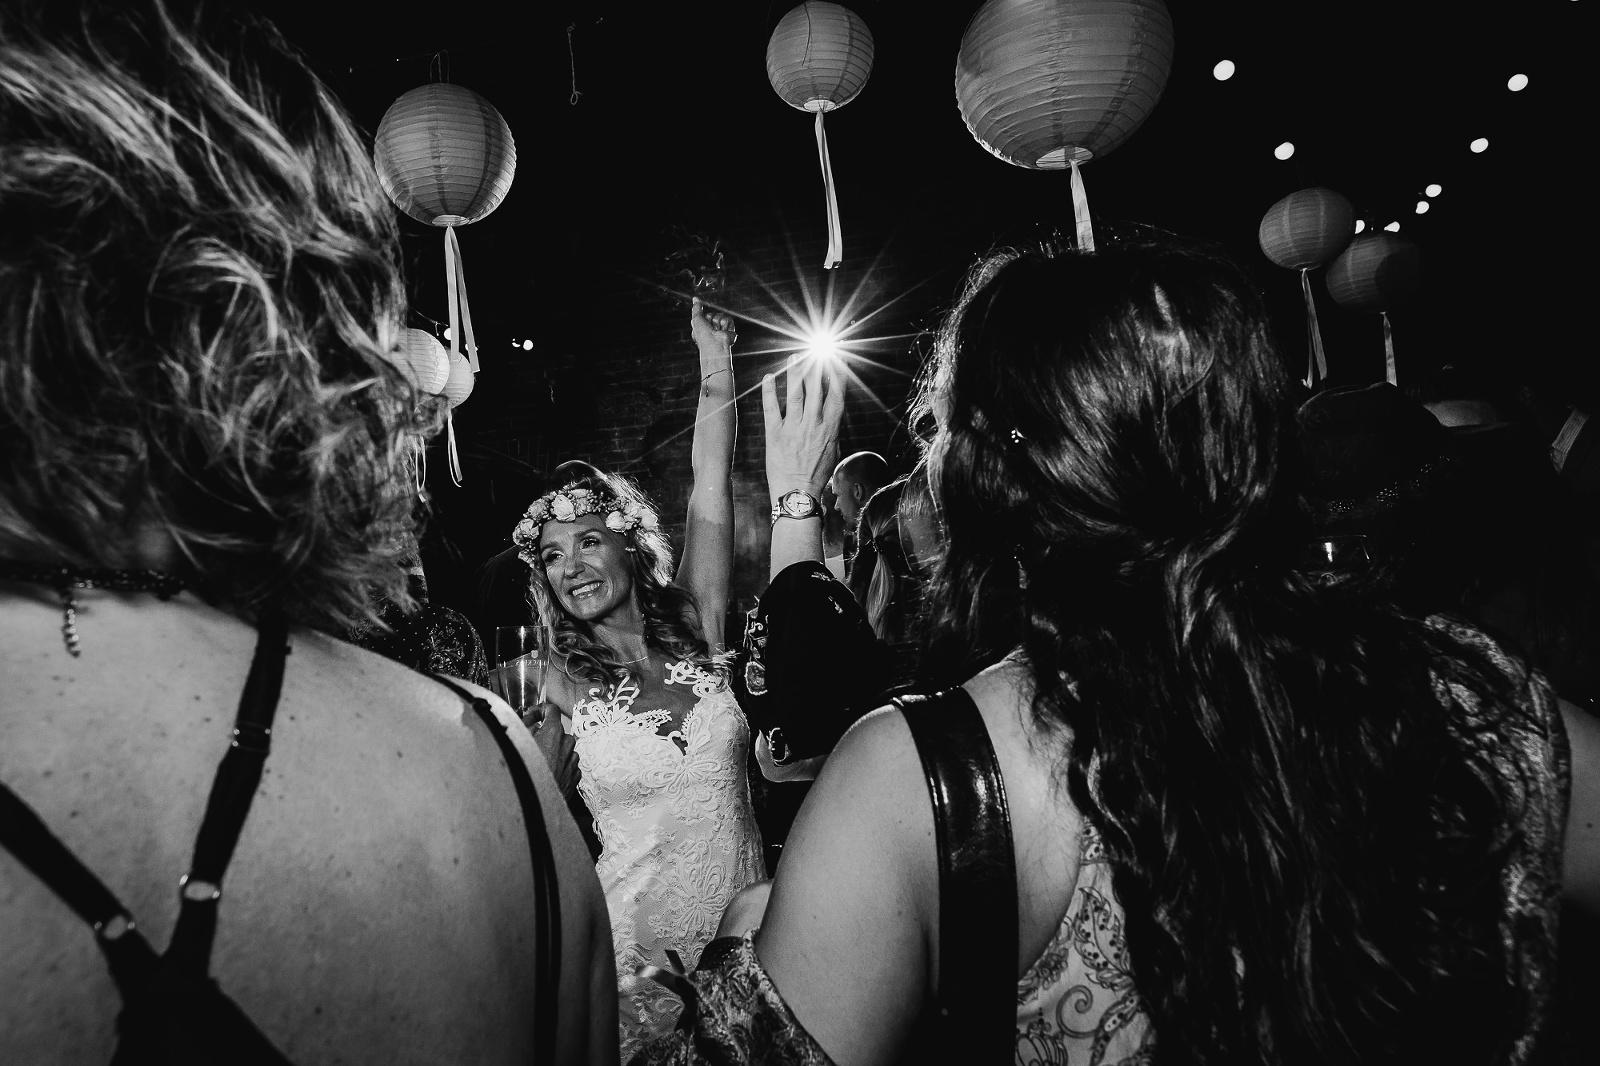 Trouwfoto's, trouwfeest, trouwen in 2019, bruidsfotografie, trouwfotograaf, foto's bruiloft, bruid, bruidegom